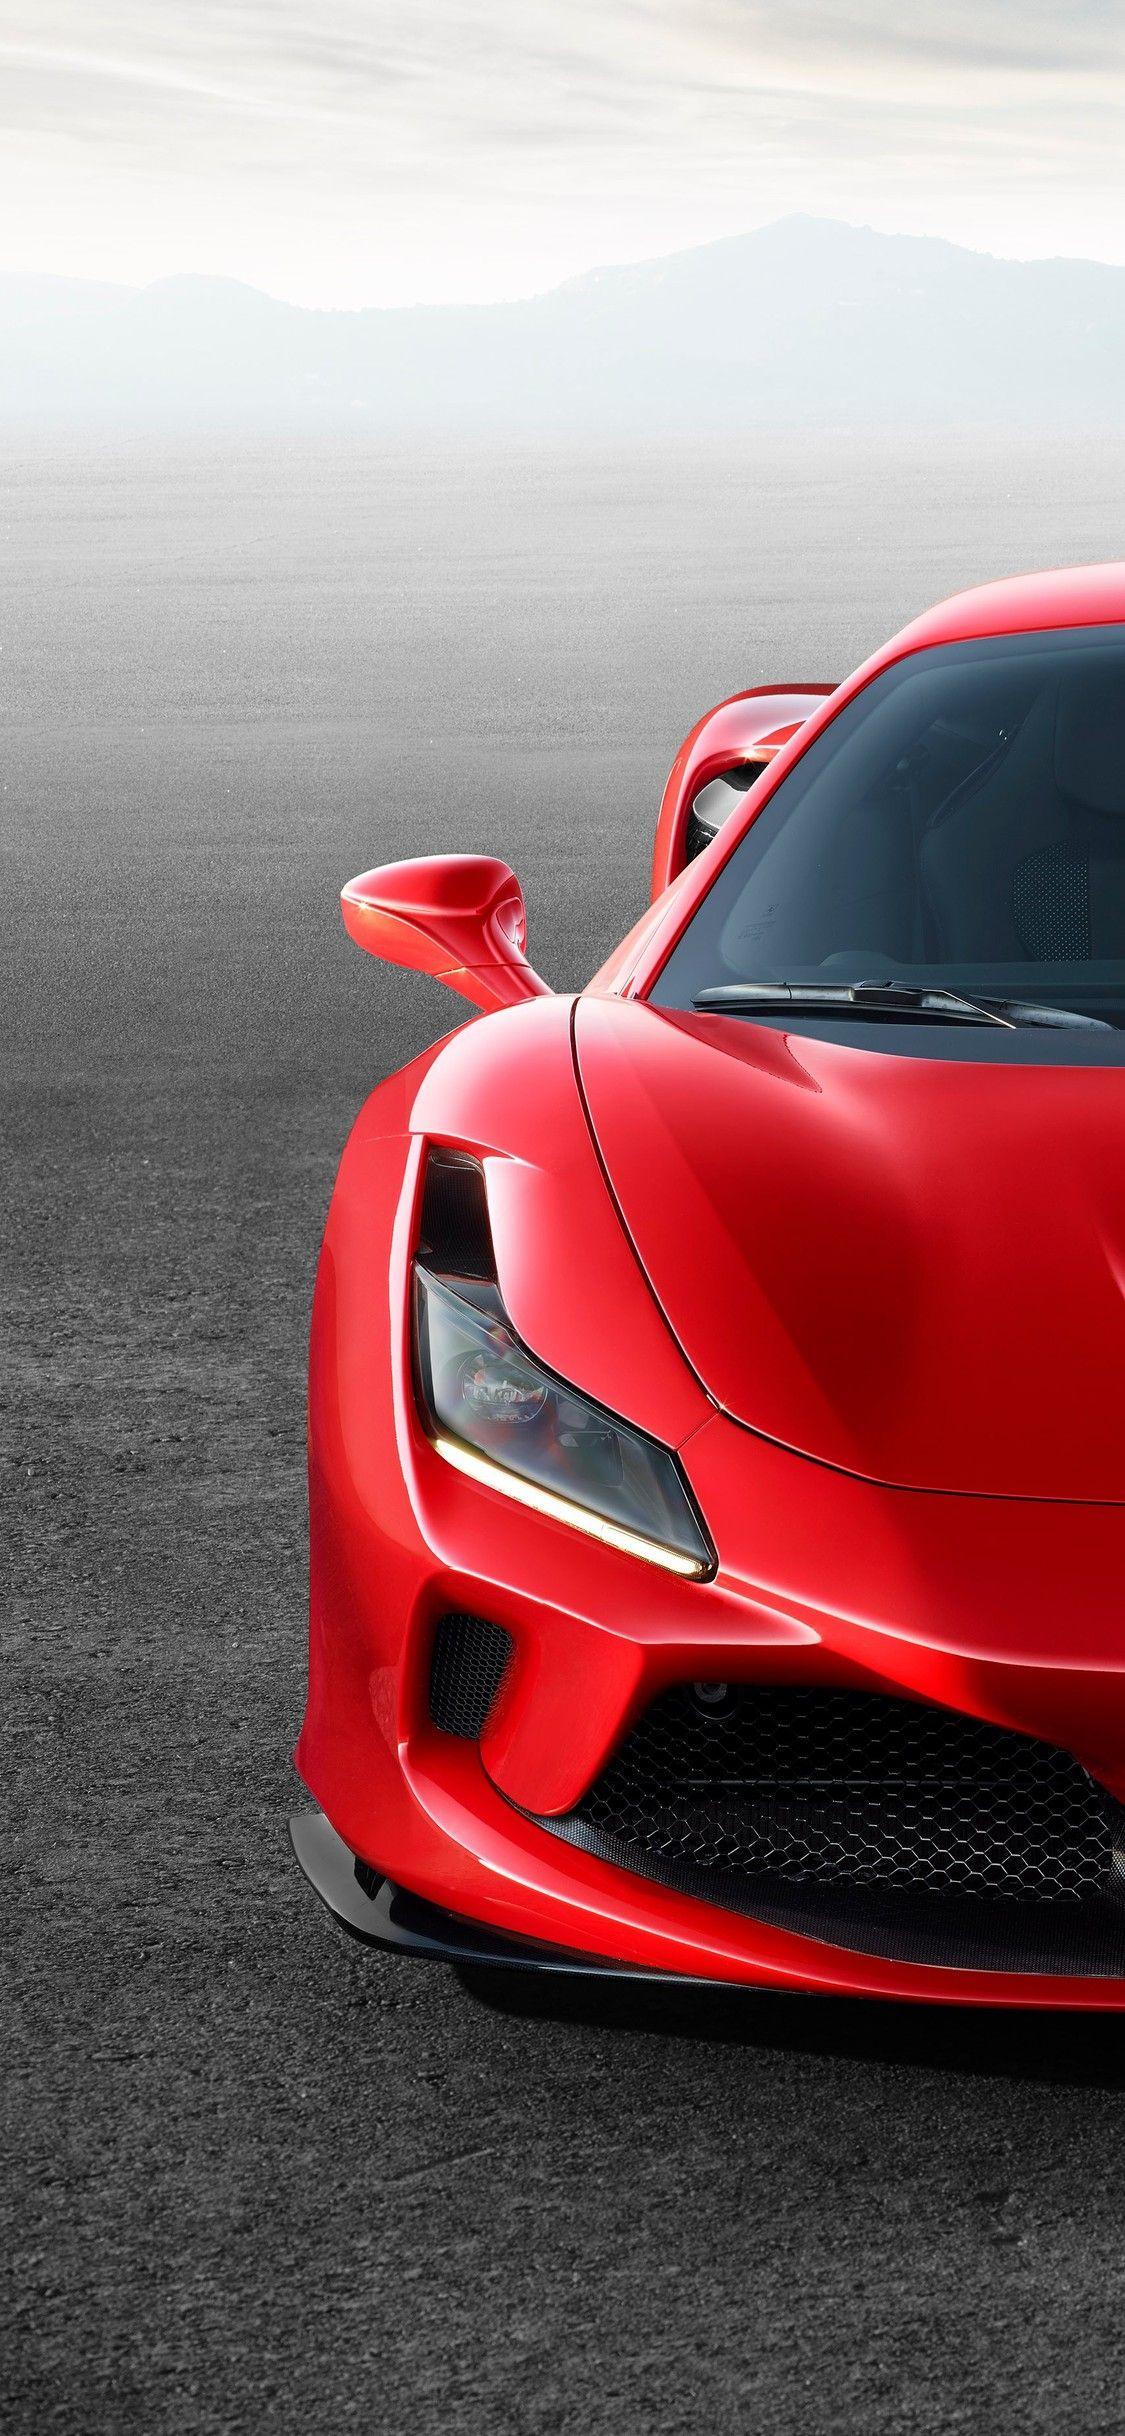 Get Ferrari Wallpaper Iphone Black Background